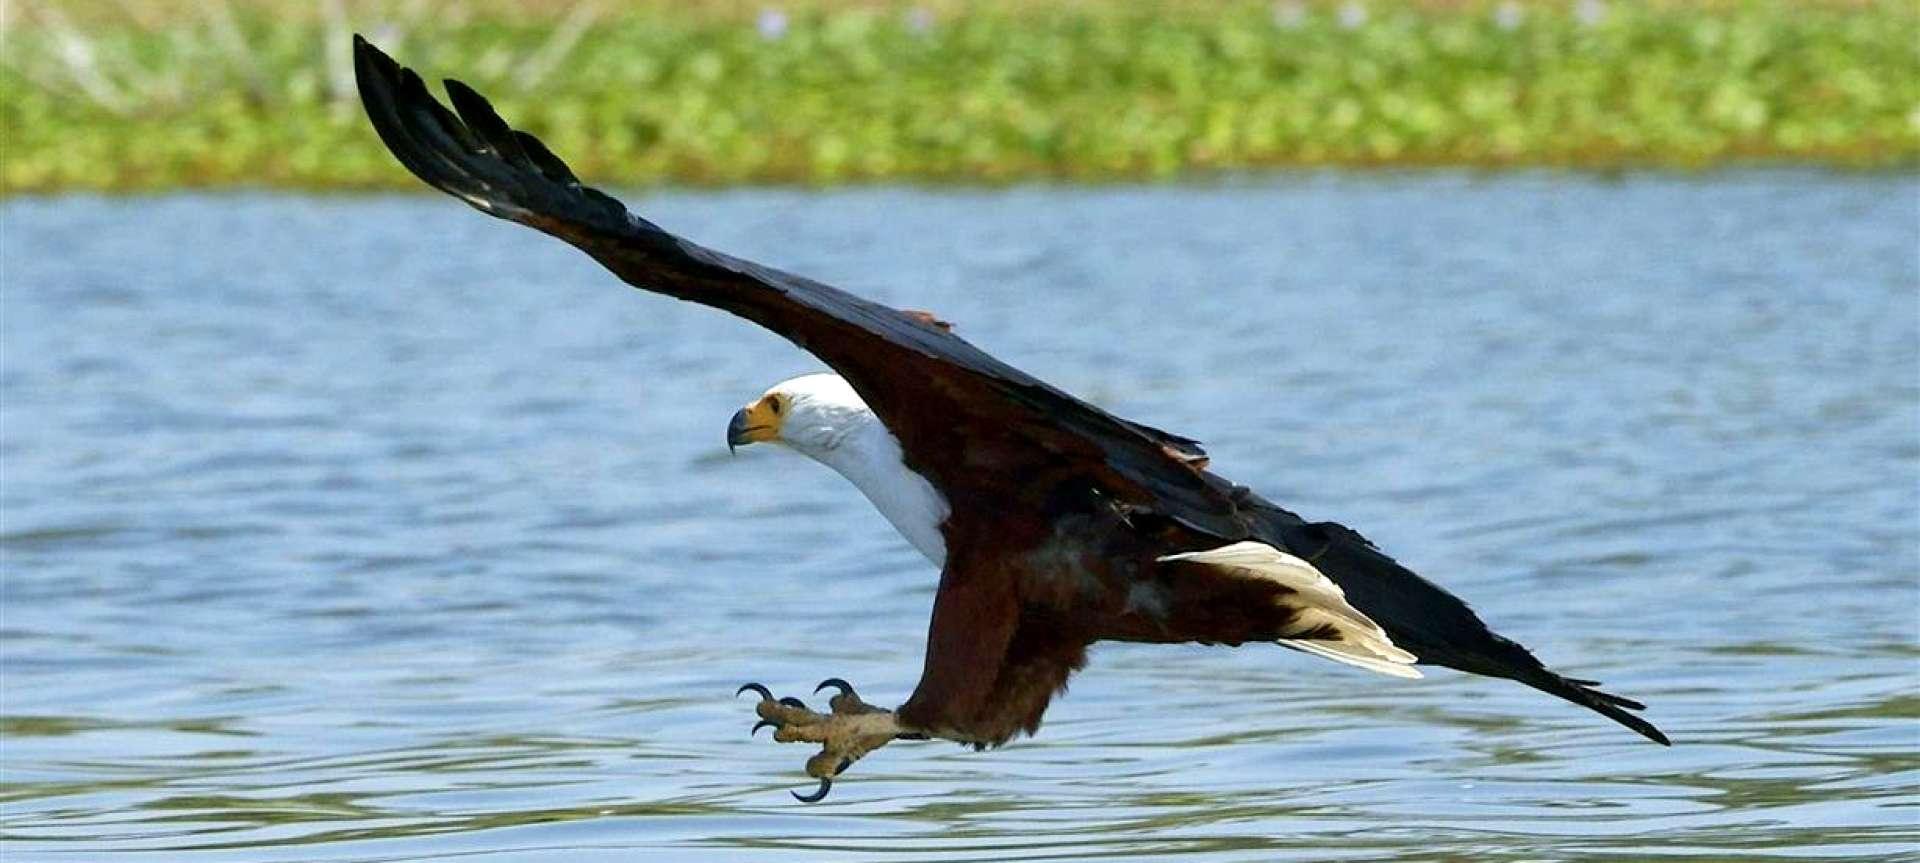 Lake Naivasha National Park - Africa Wildlife Safaris